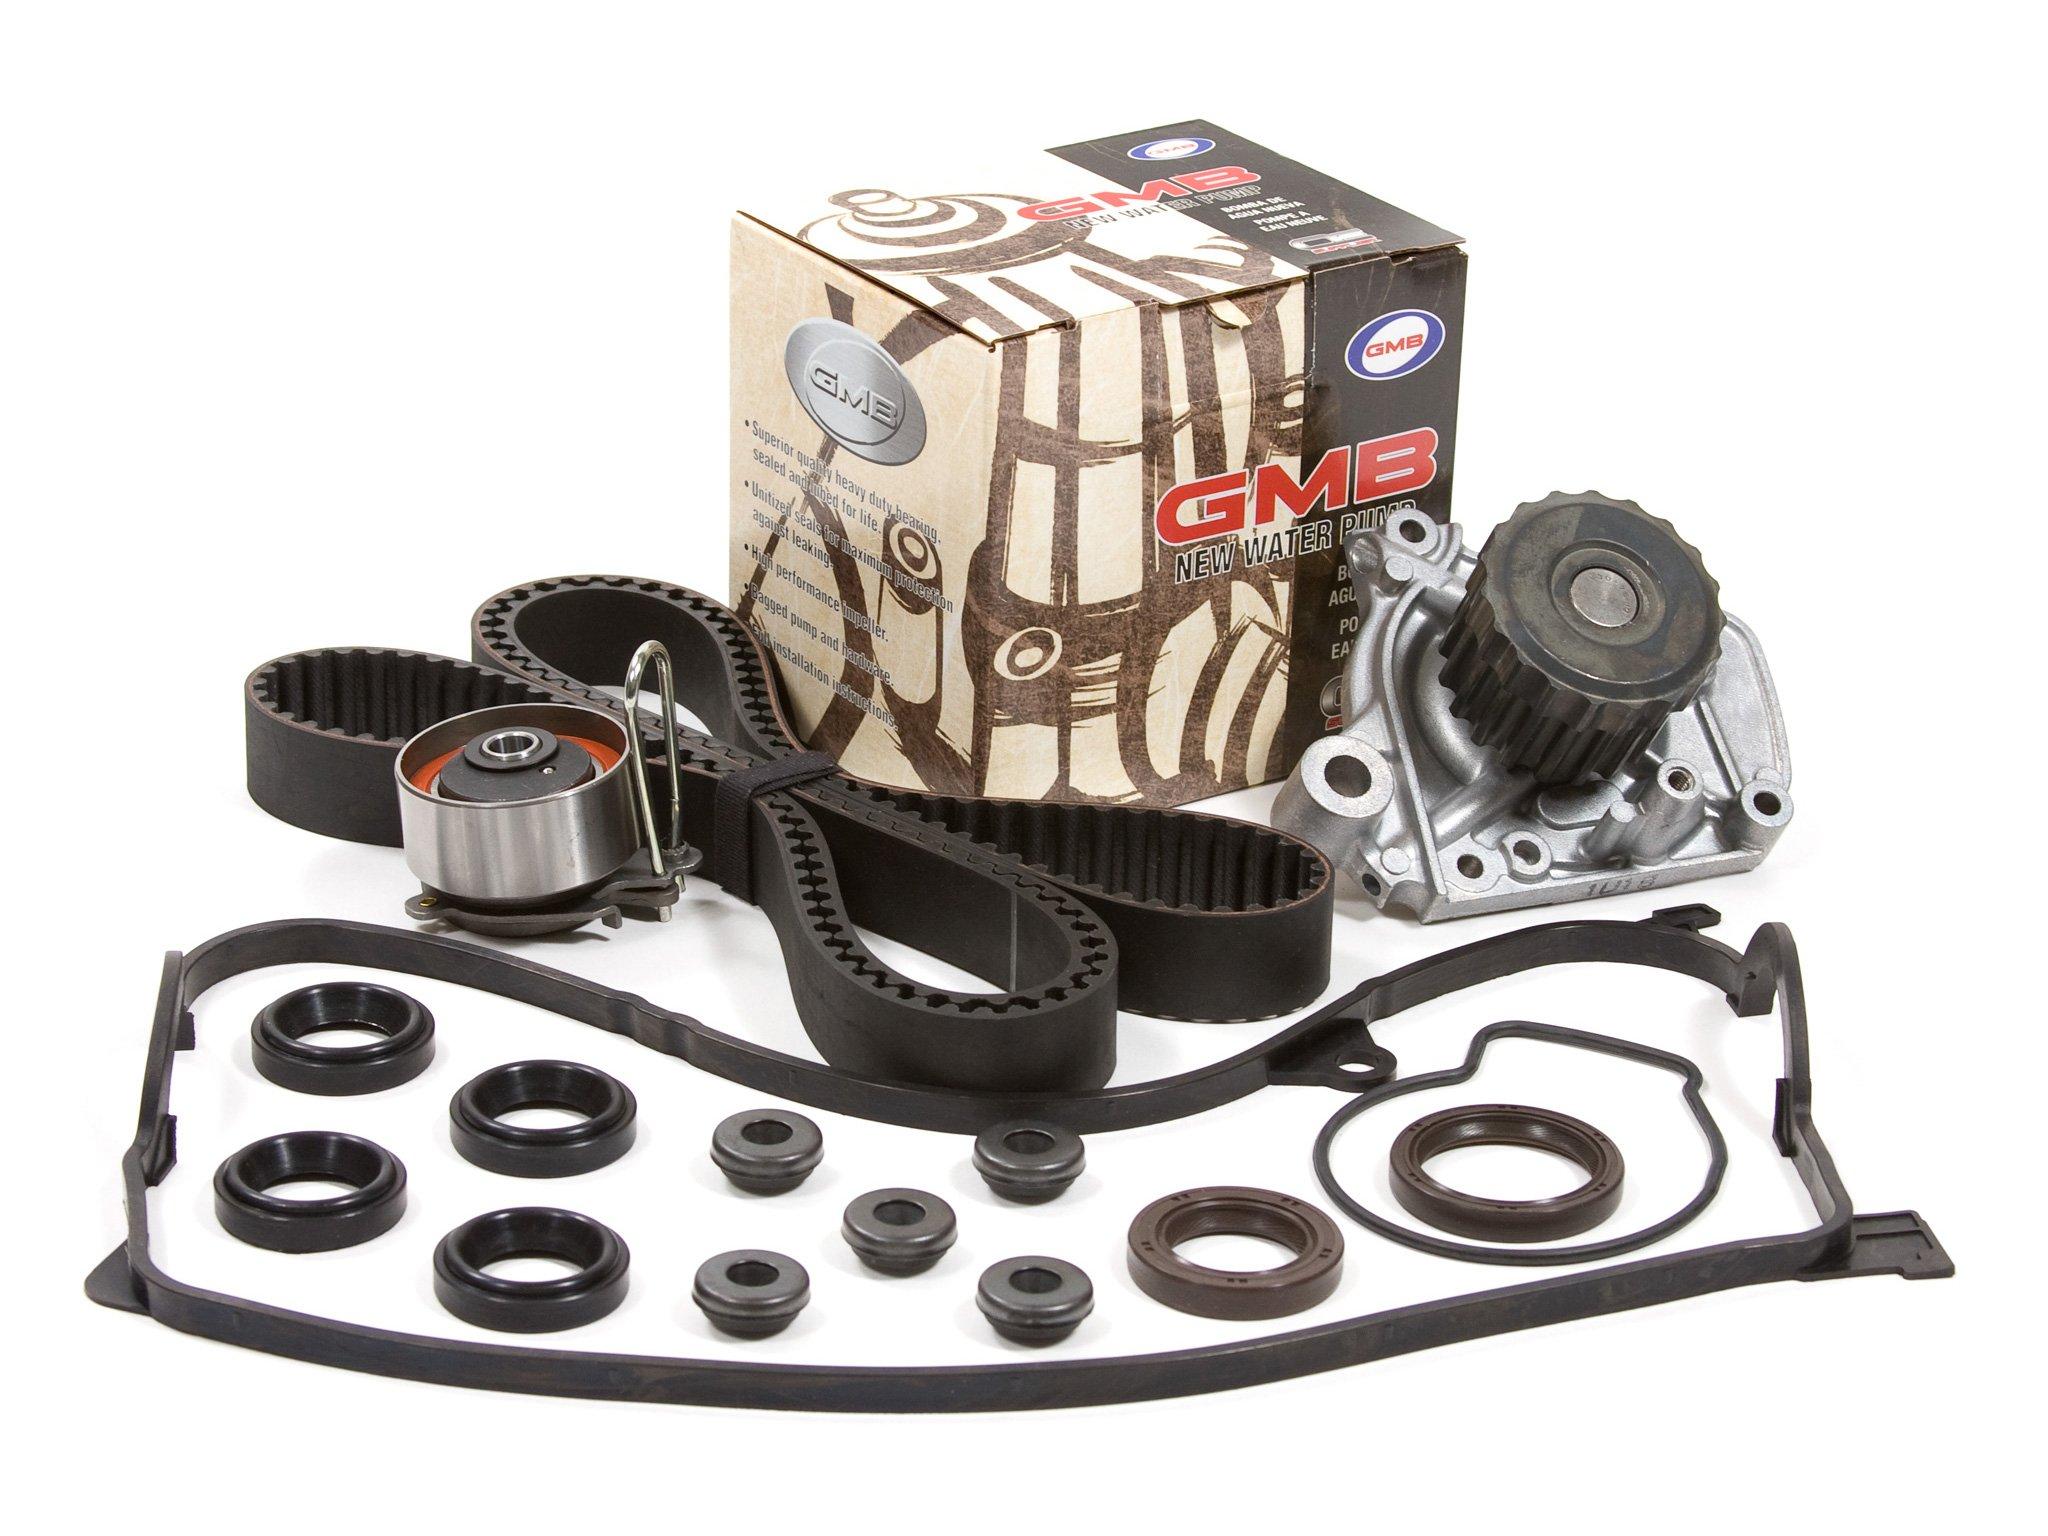 Evergreen TBK312VC Honda Civic DX EX GX LX 1.7 Timing Seal D17A Timing Belt Kit Valve Cover Gasket GMB Water Pump